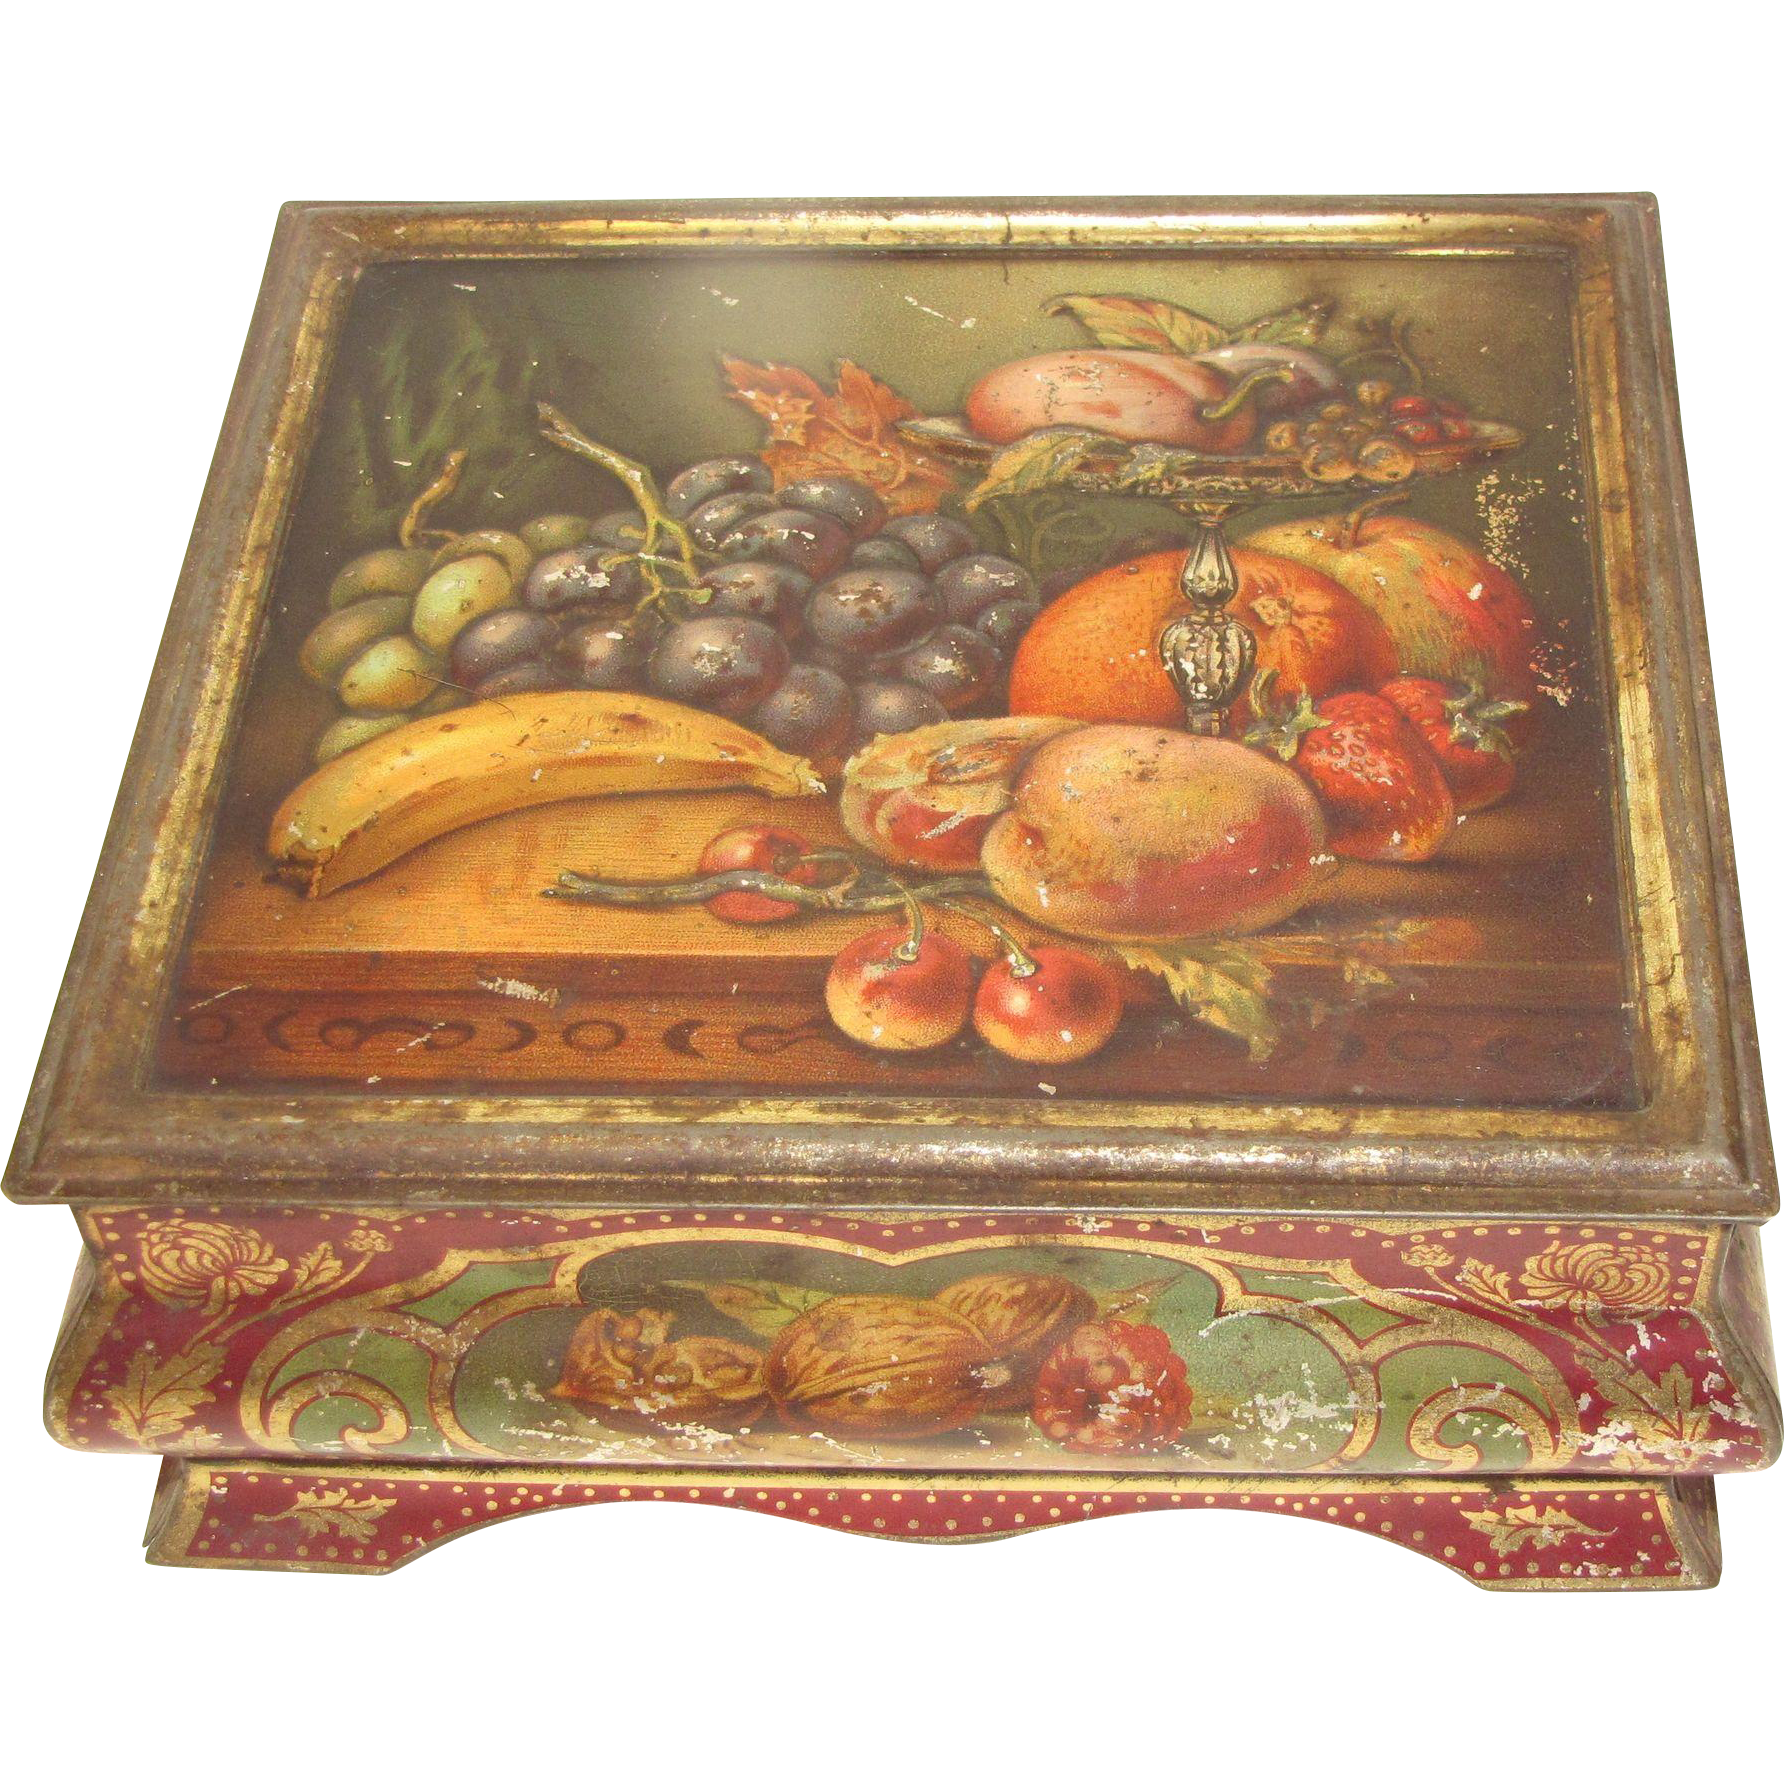 Very Early British Tin Casket, Fruit Still Life, Meredith & Drew